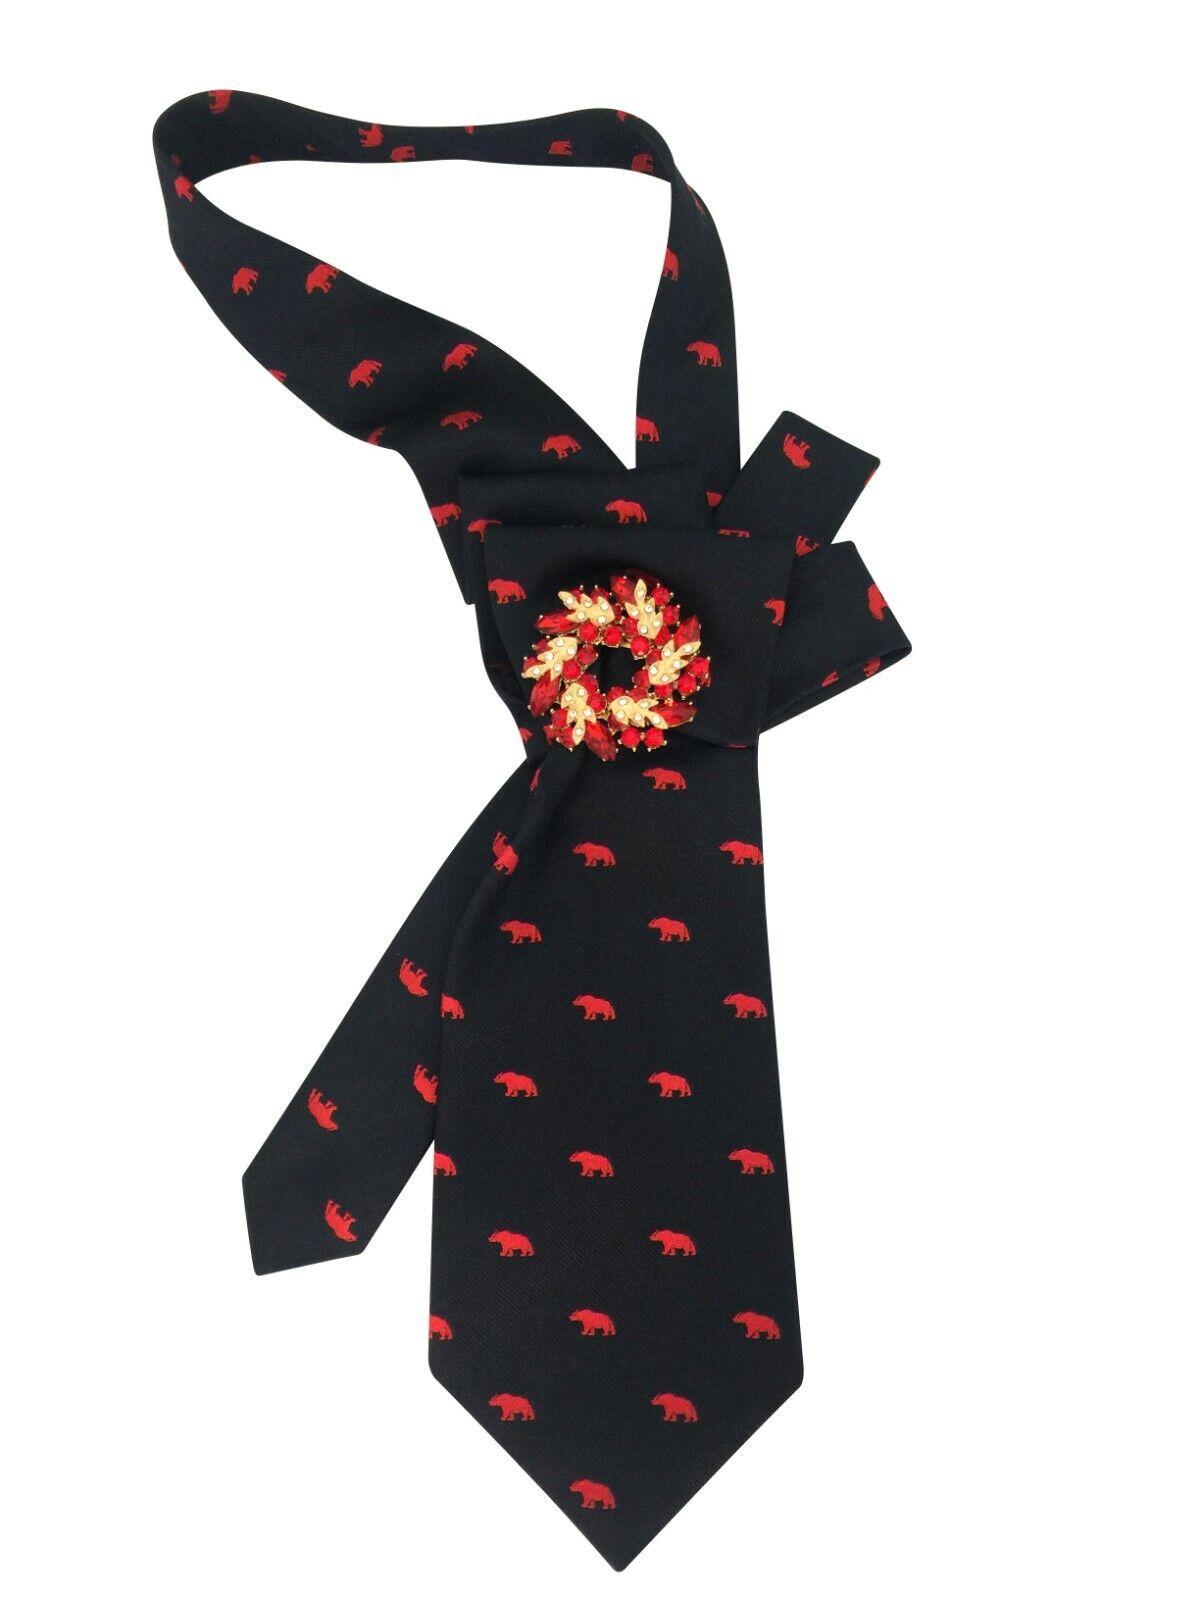 Tie women's Silk Italy. Collar necklace necktie cravat Hand-made